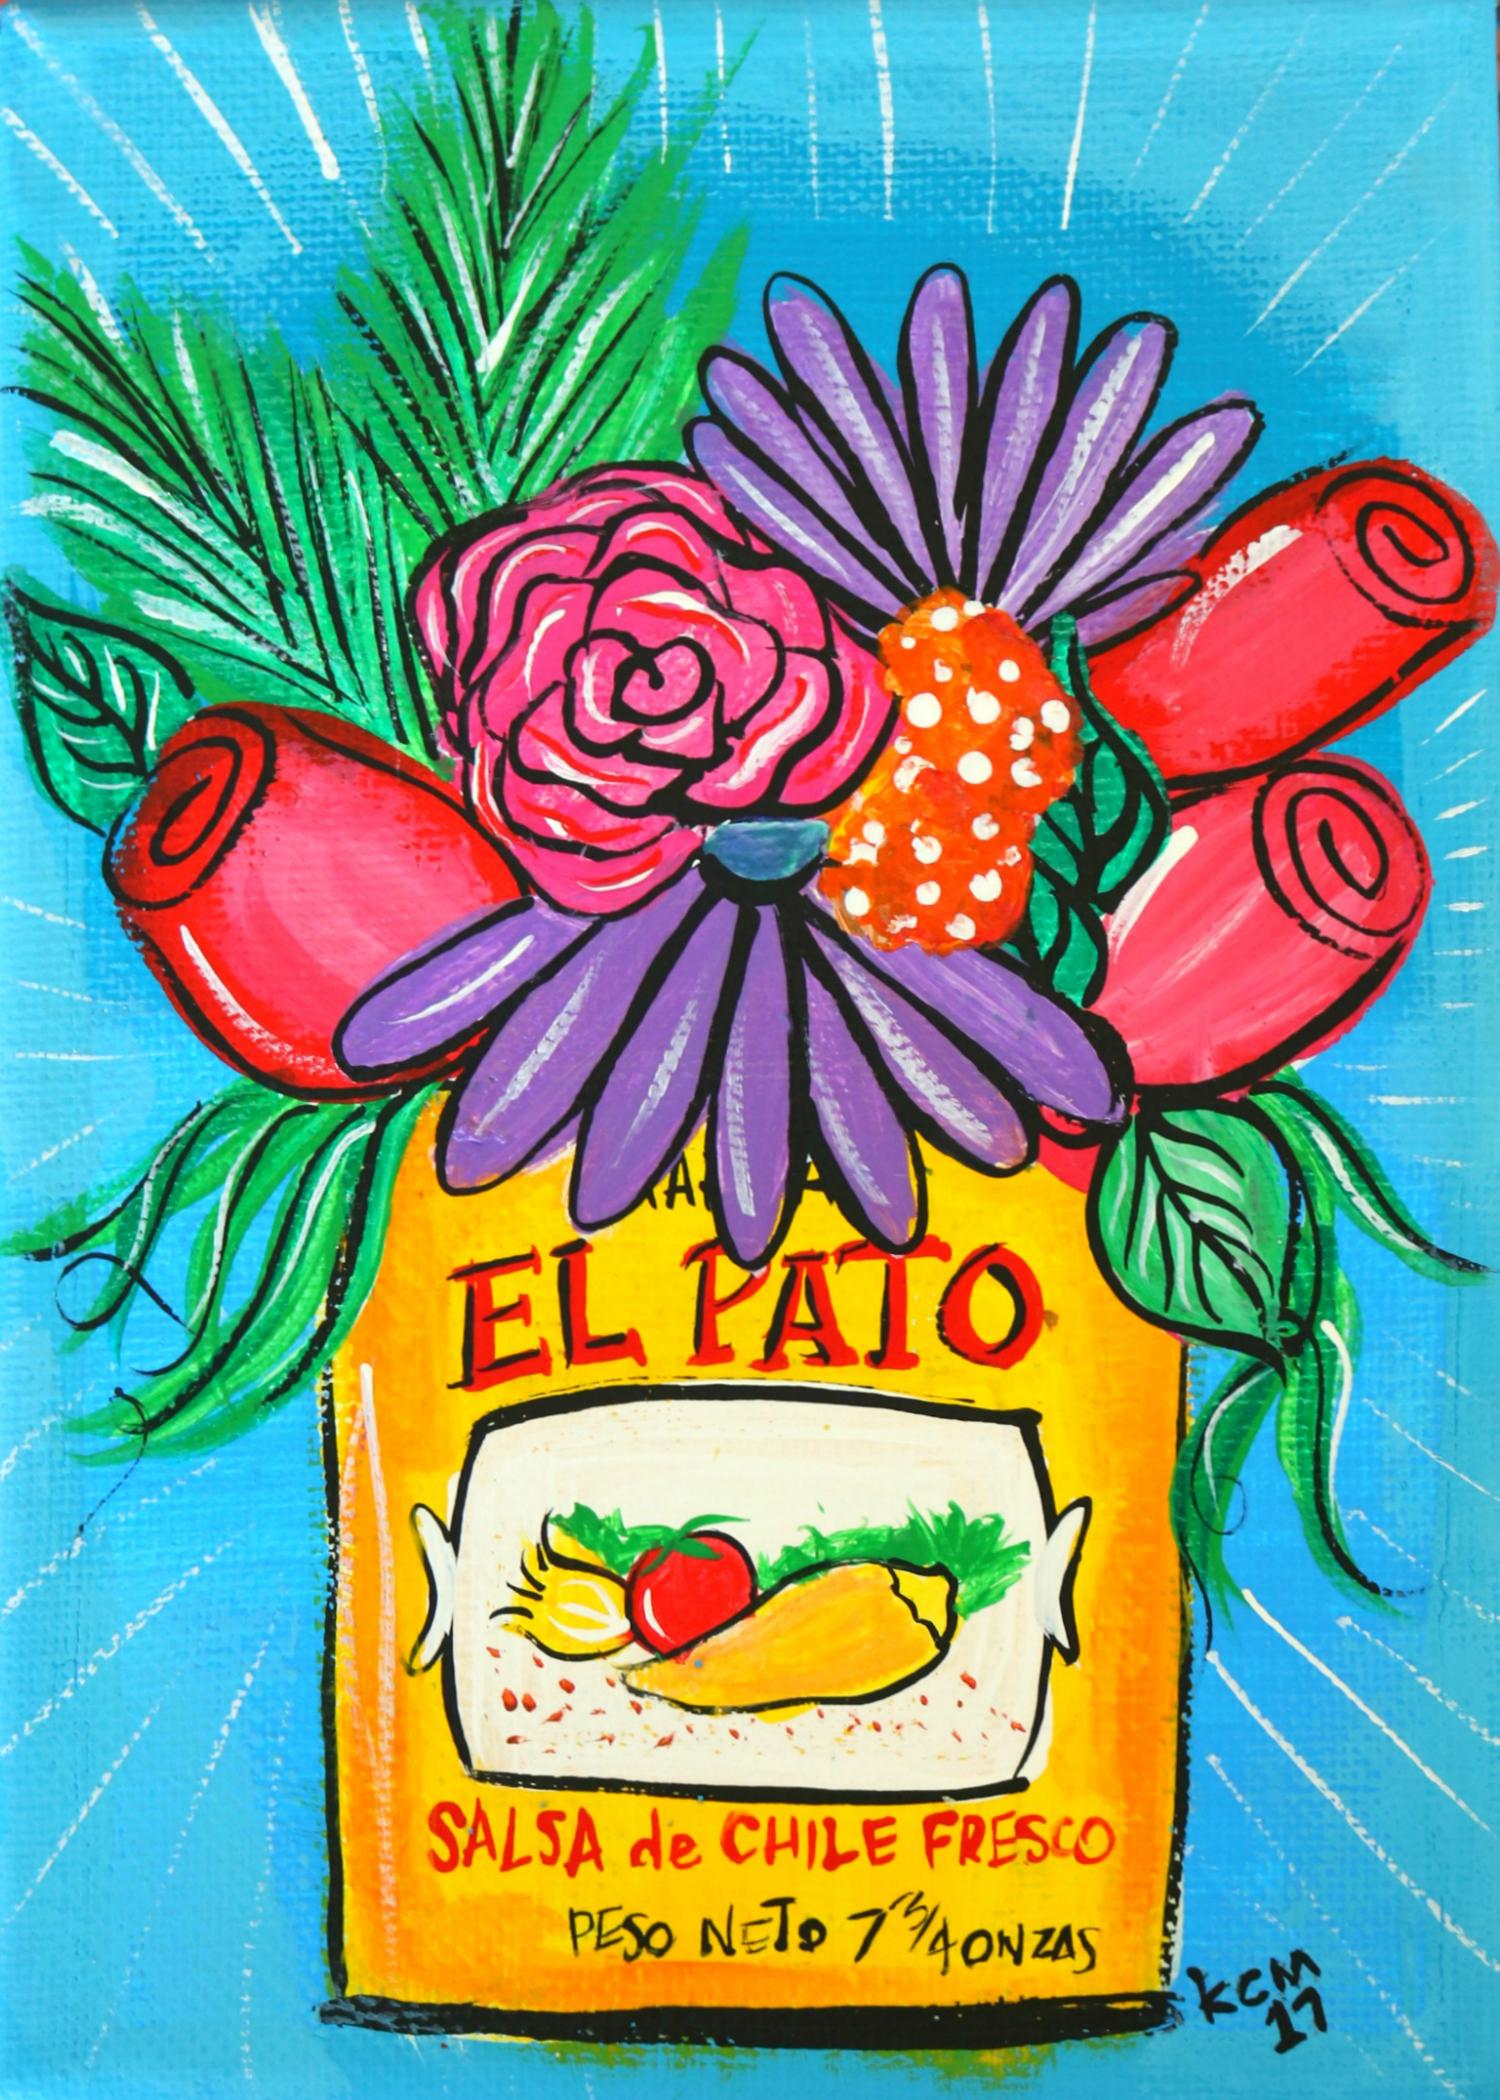 El pato by kathy cano-murillo, acrylic on canvas.